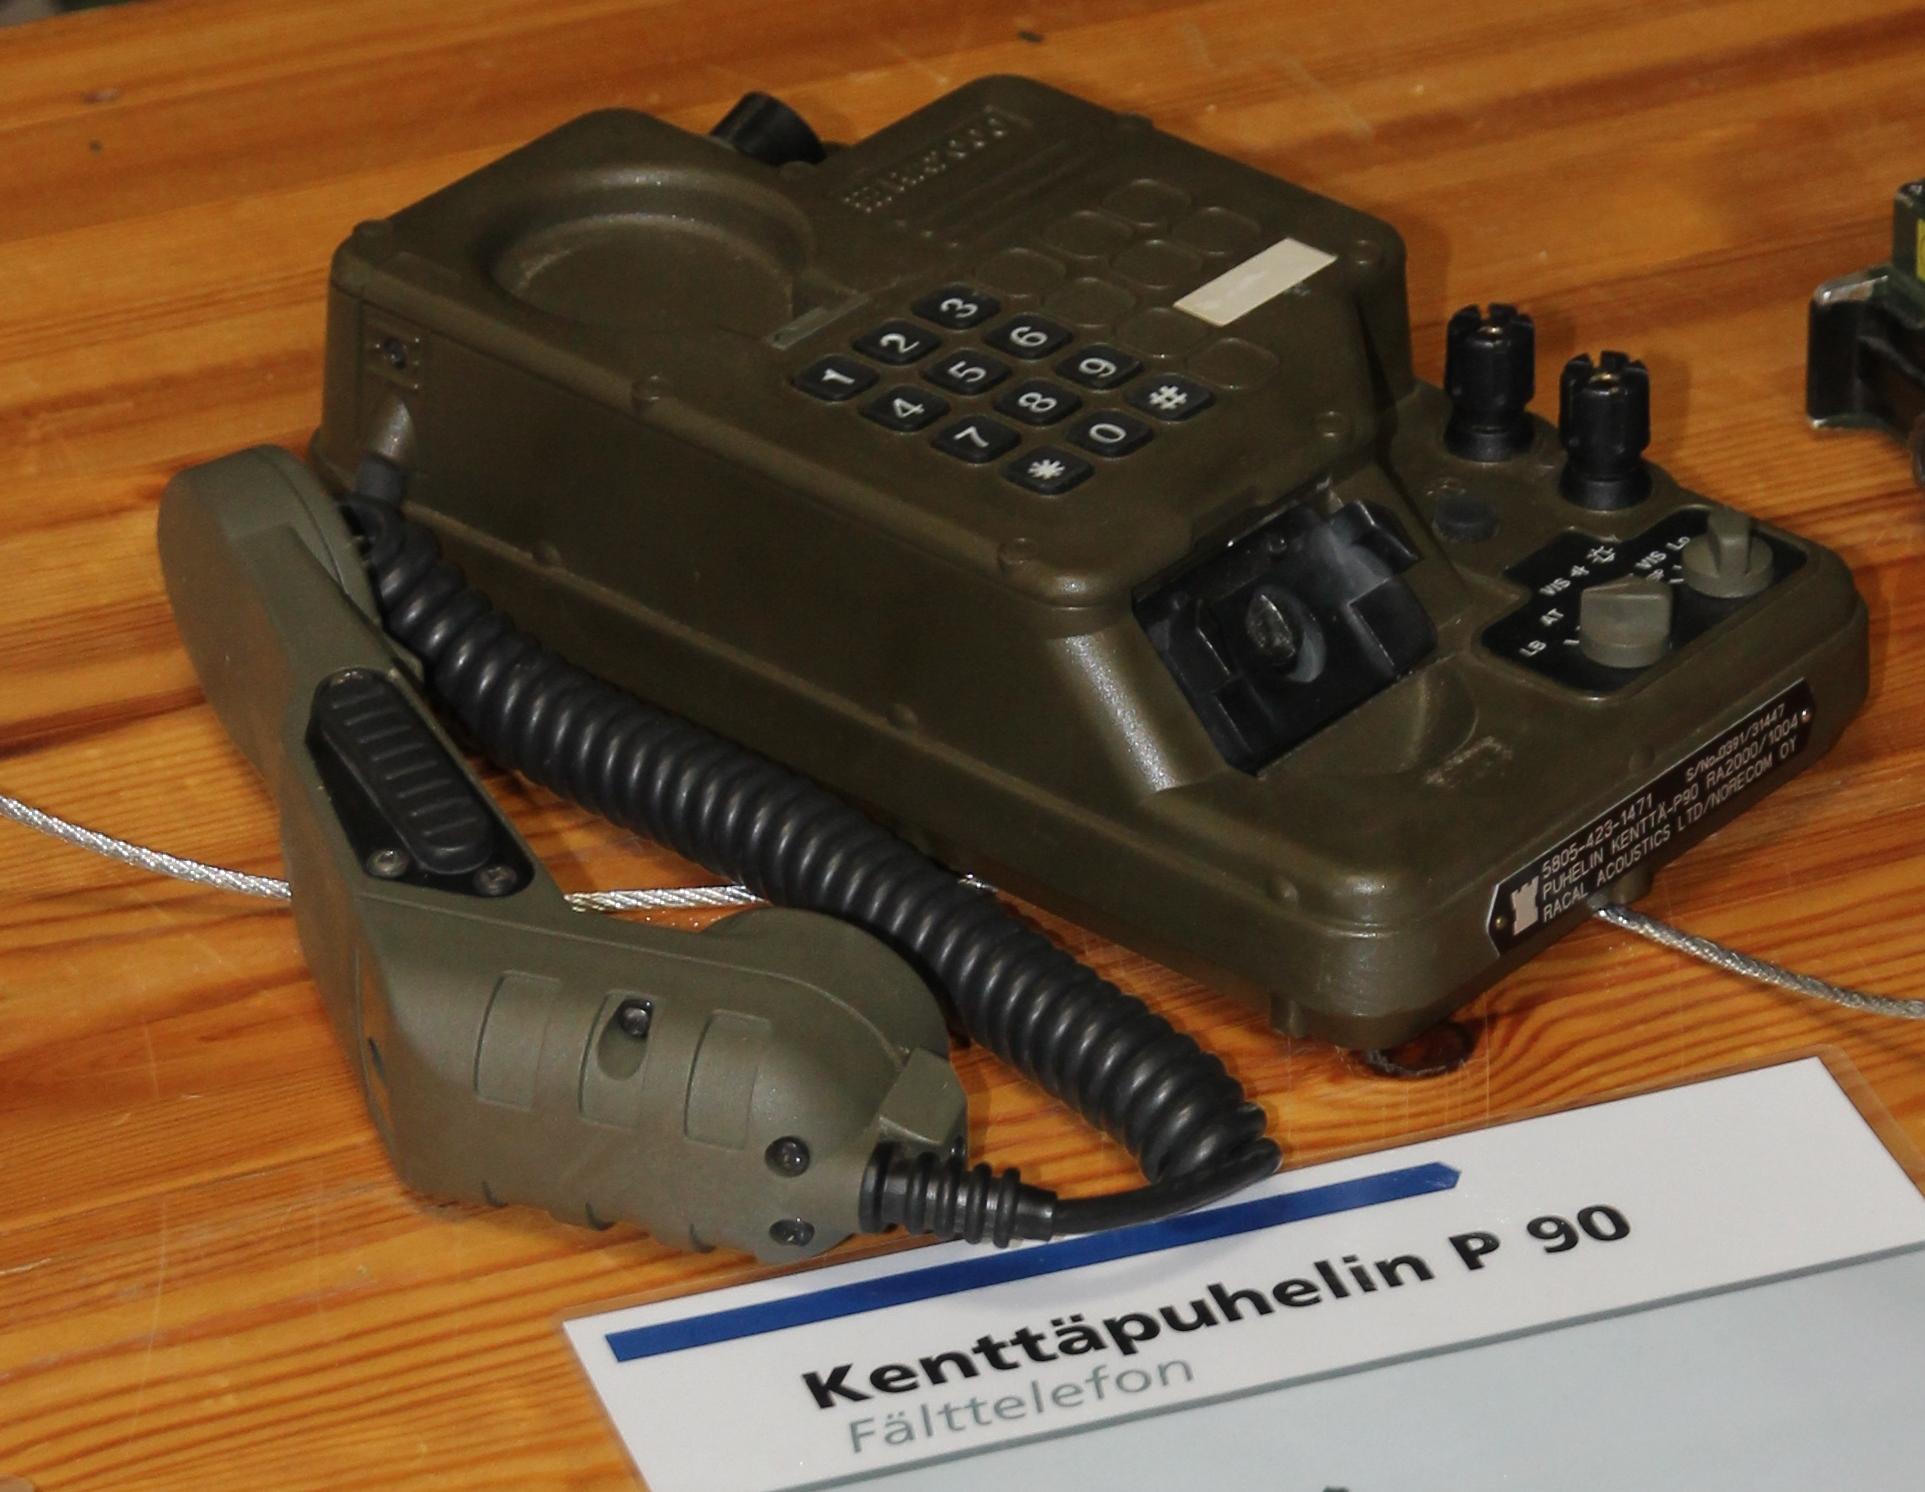 90fieldtelephone